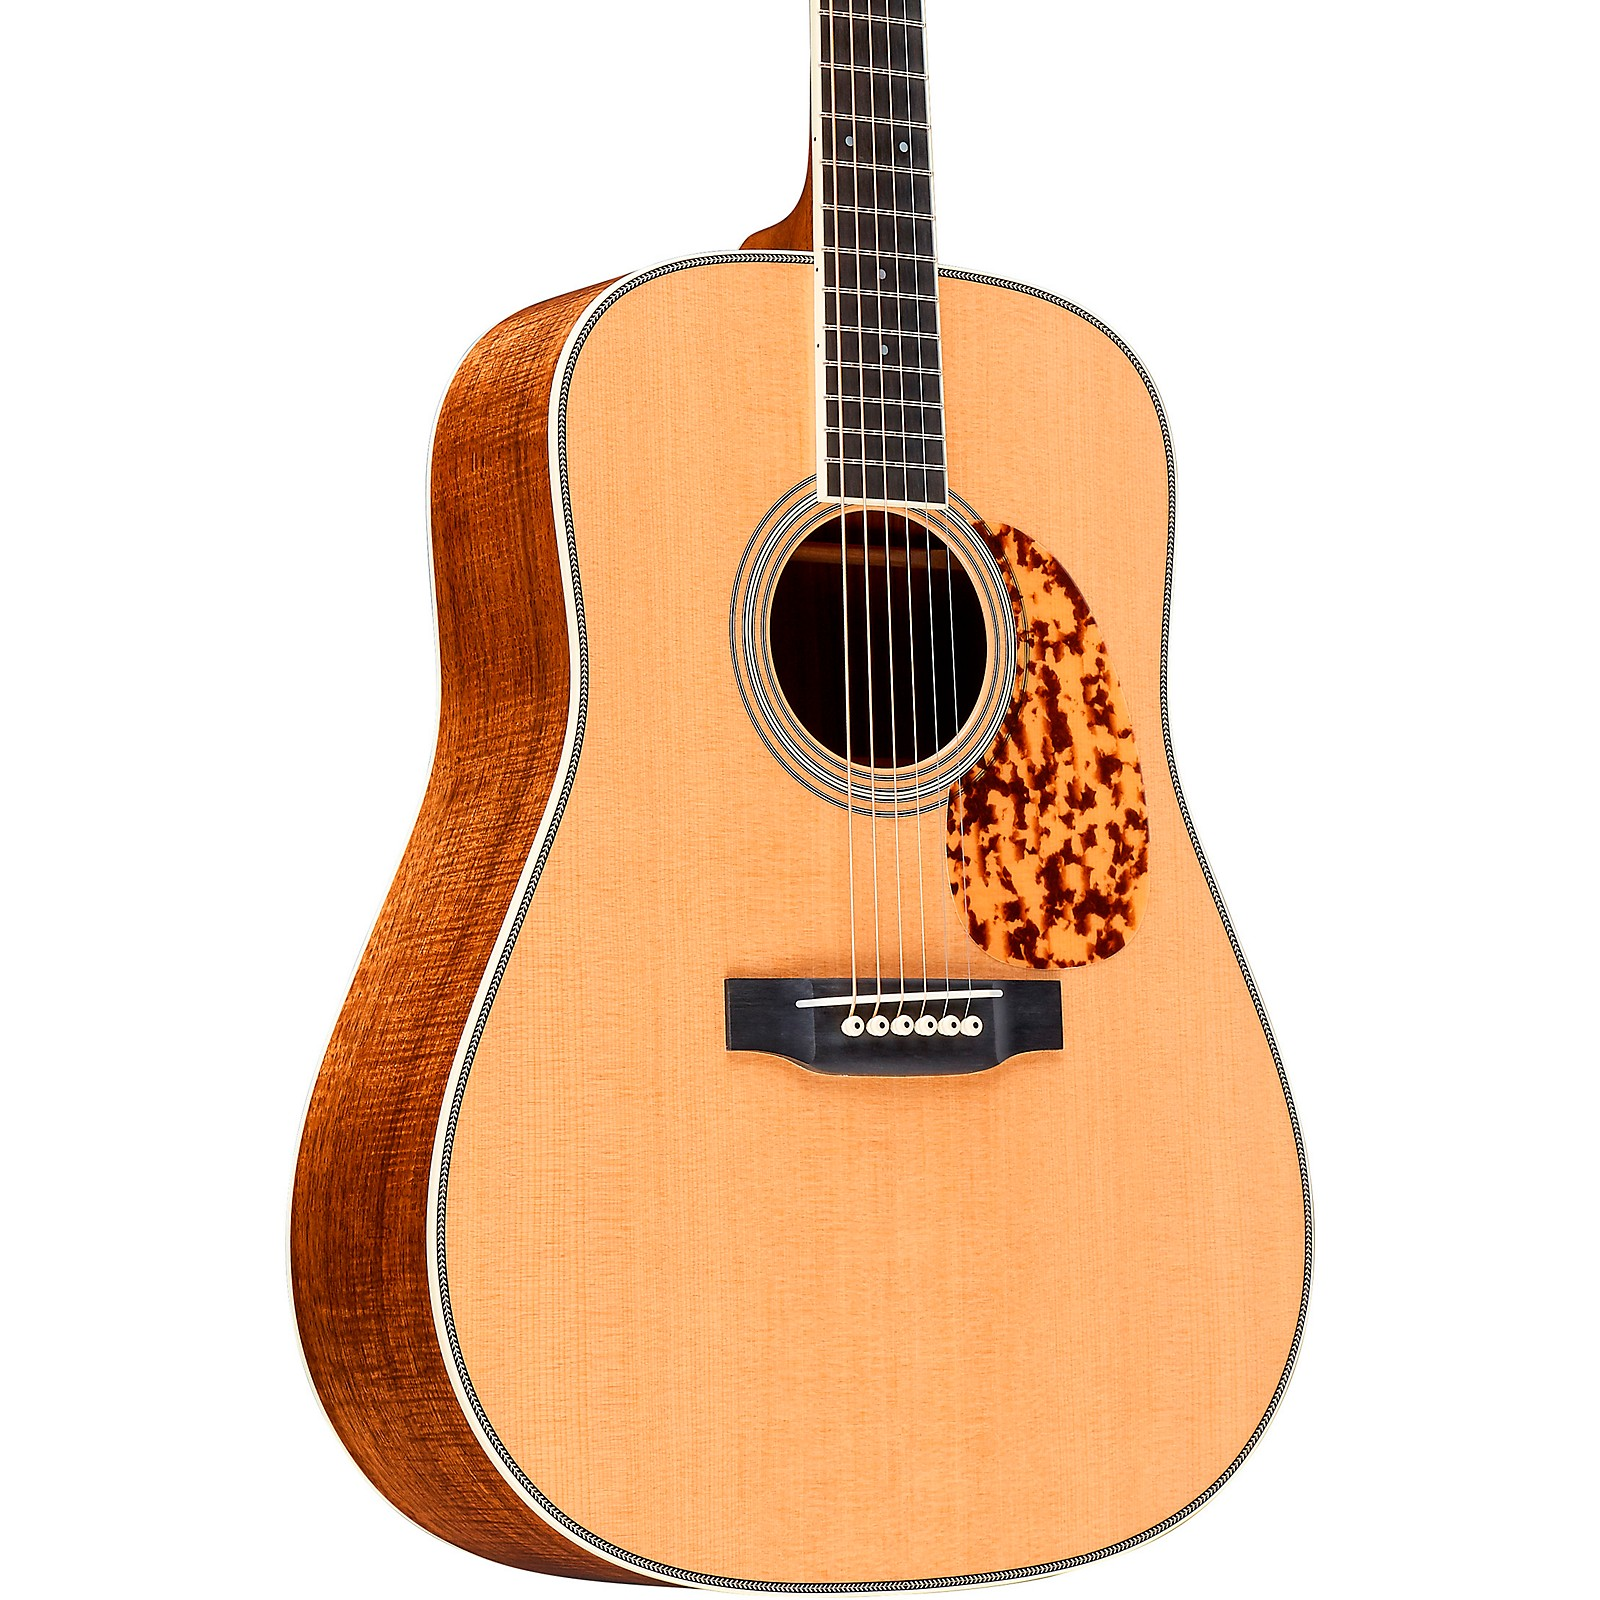 Martin Custom Highly Flamed Koa Dreadnought Acoustic Guitar